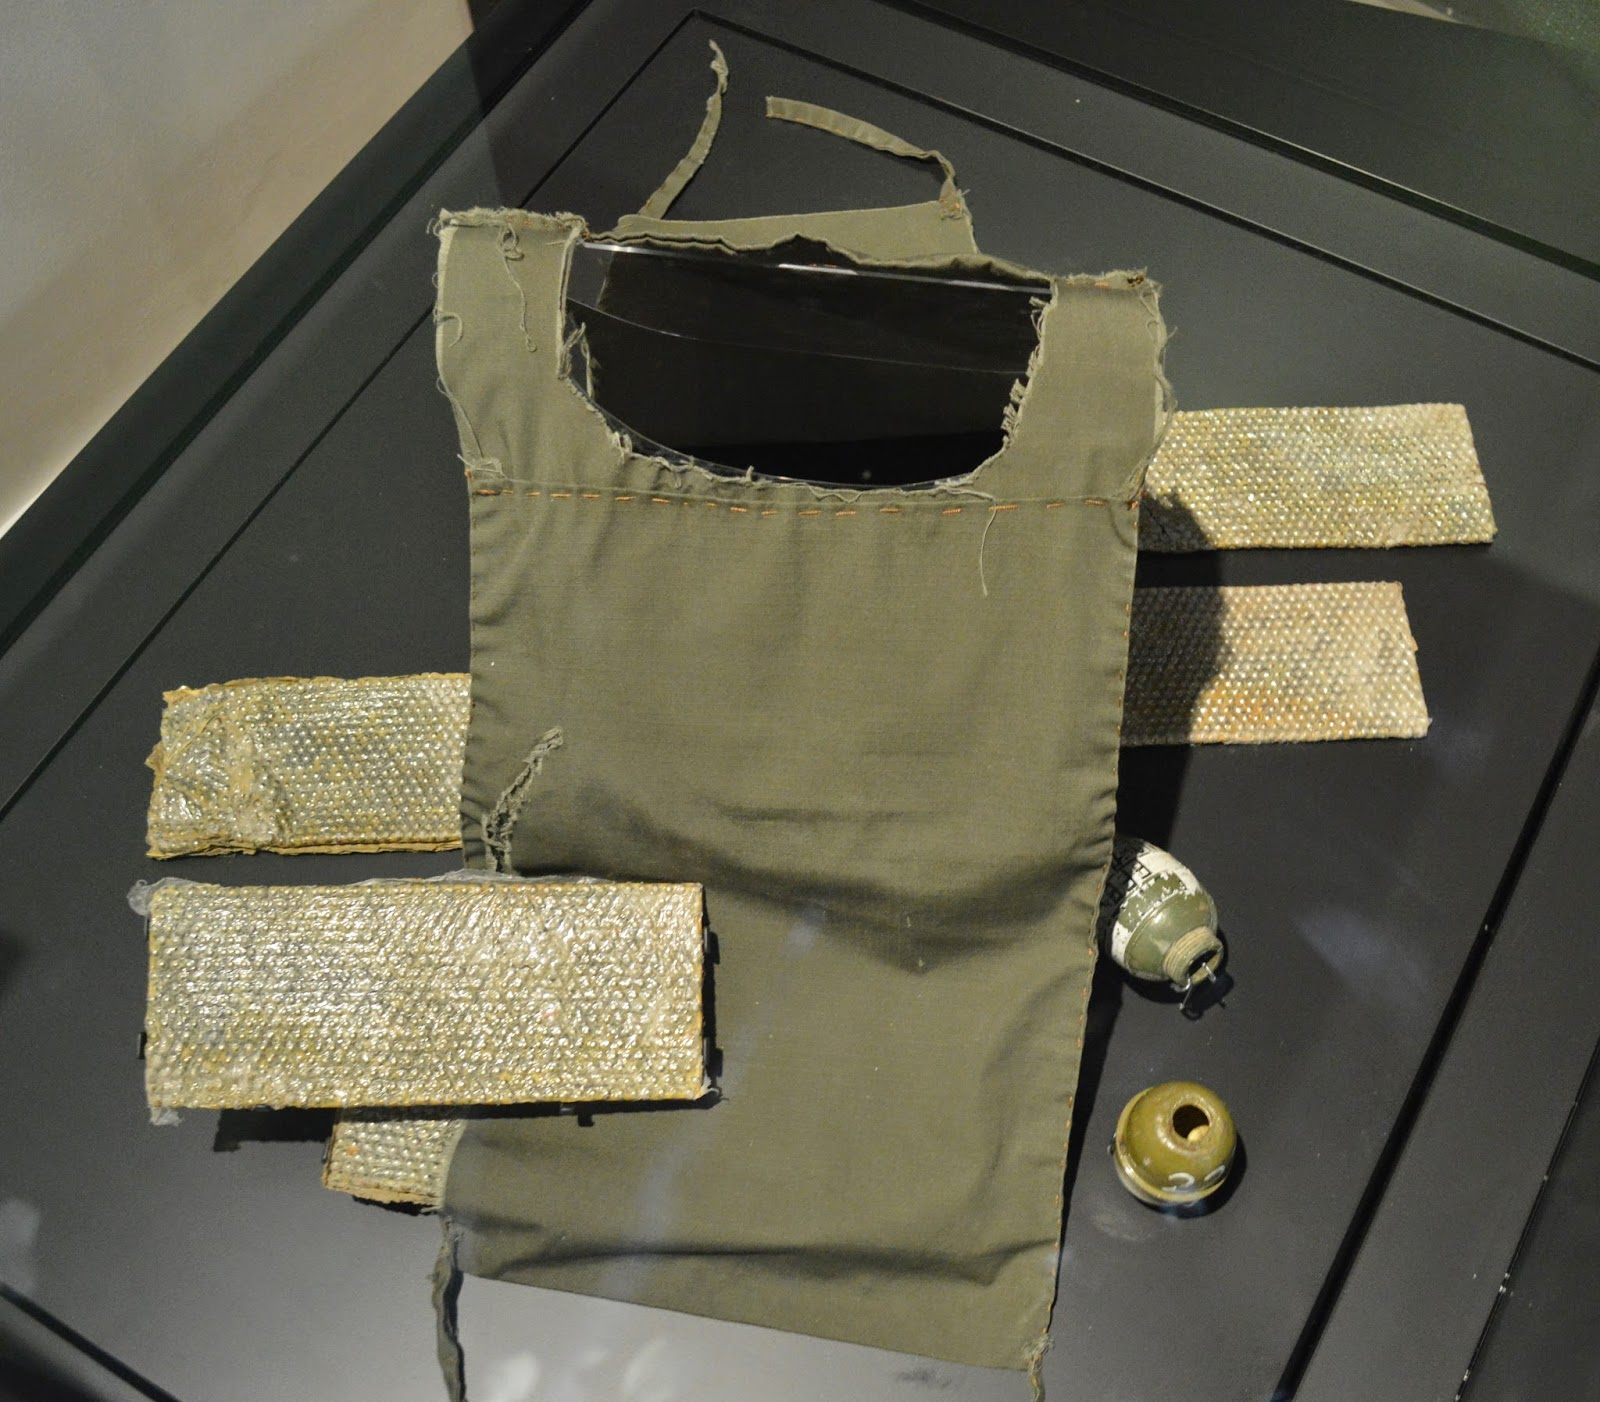 suicide vest, photograph, ball bearings, Iraq, modern warfare, war, conflict, terrorism, insurgents